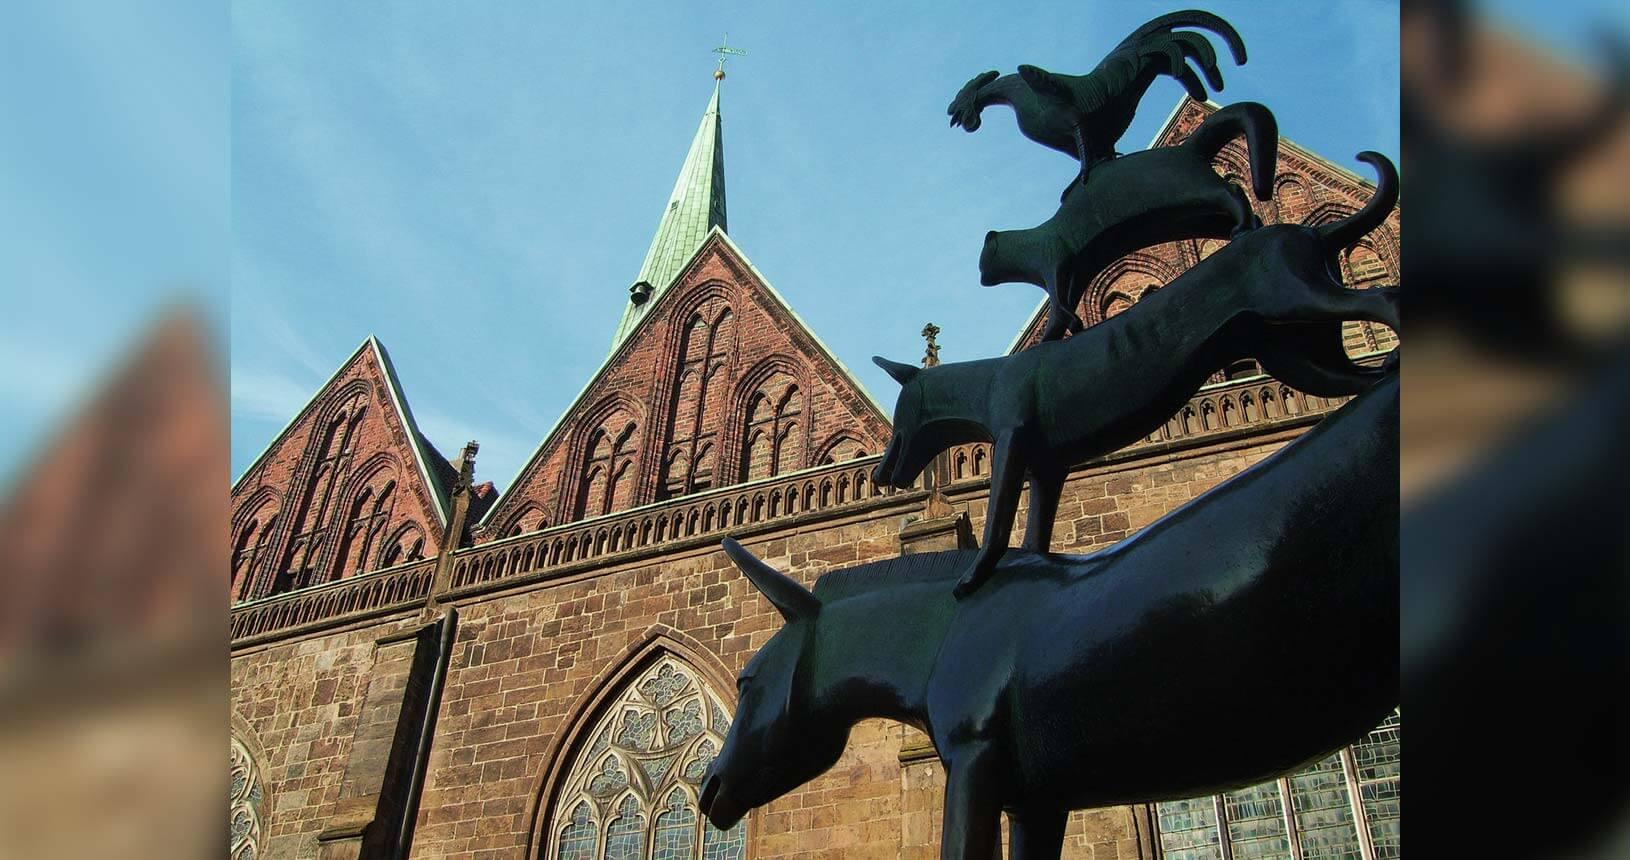 Skulptur der Bremer Stadtmusikanten vor Unserer Lieben Frauen Kirche im Anschnitt